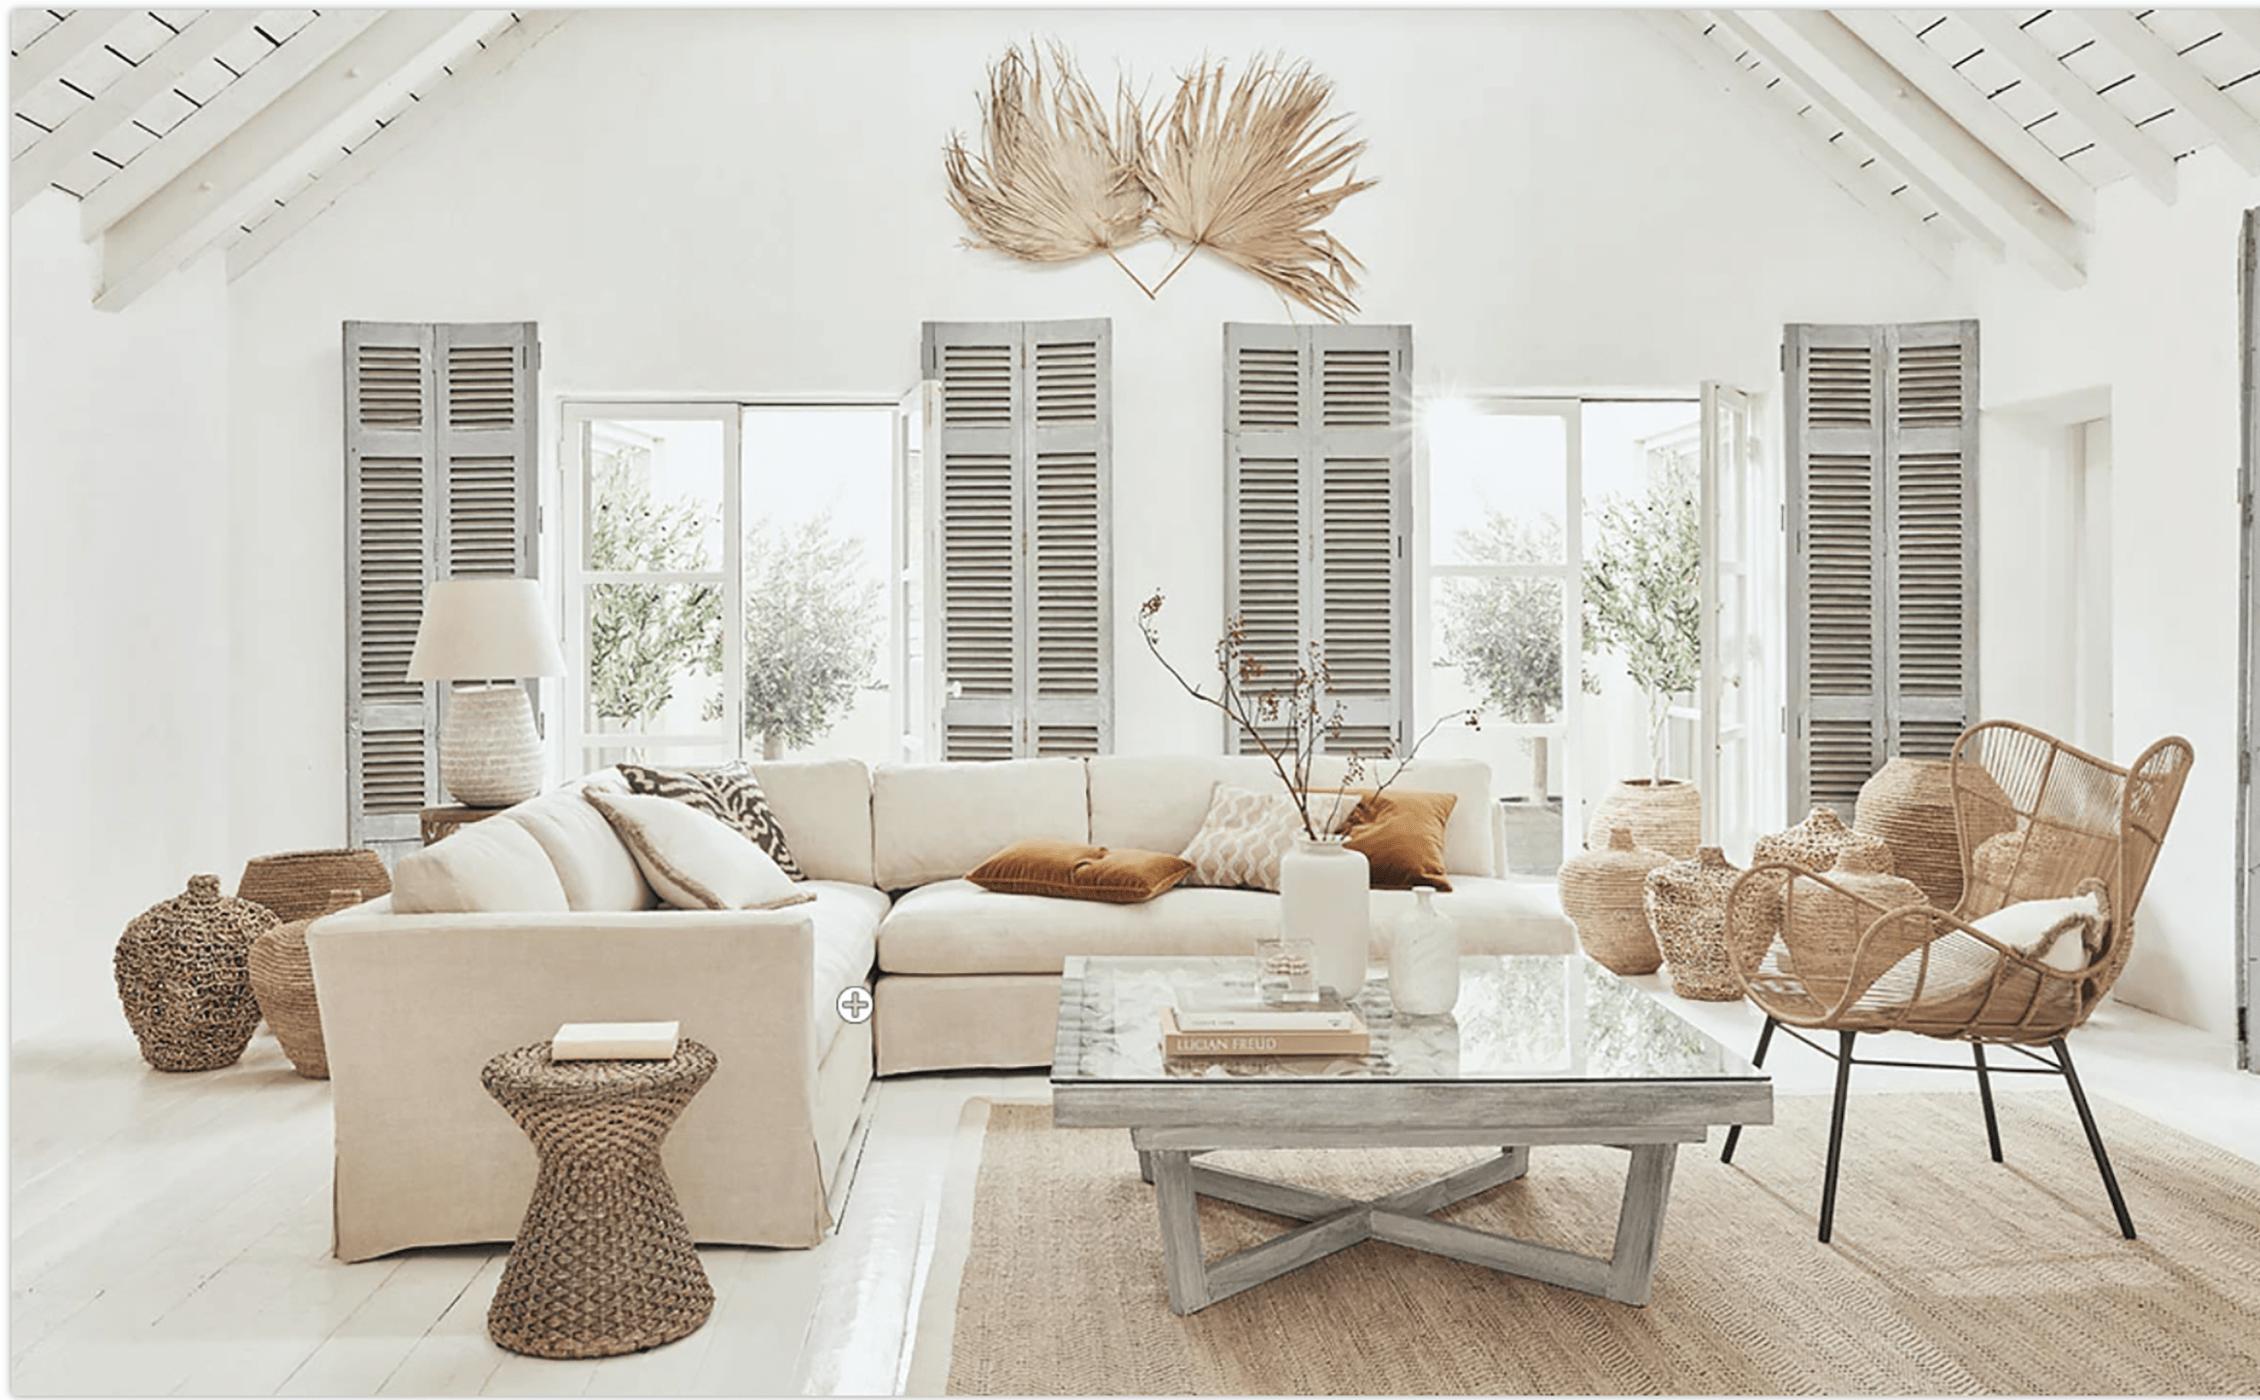 oka modern living space on cindy hattersley's blog